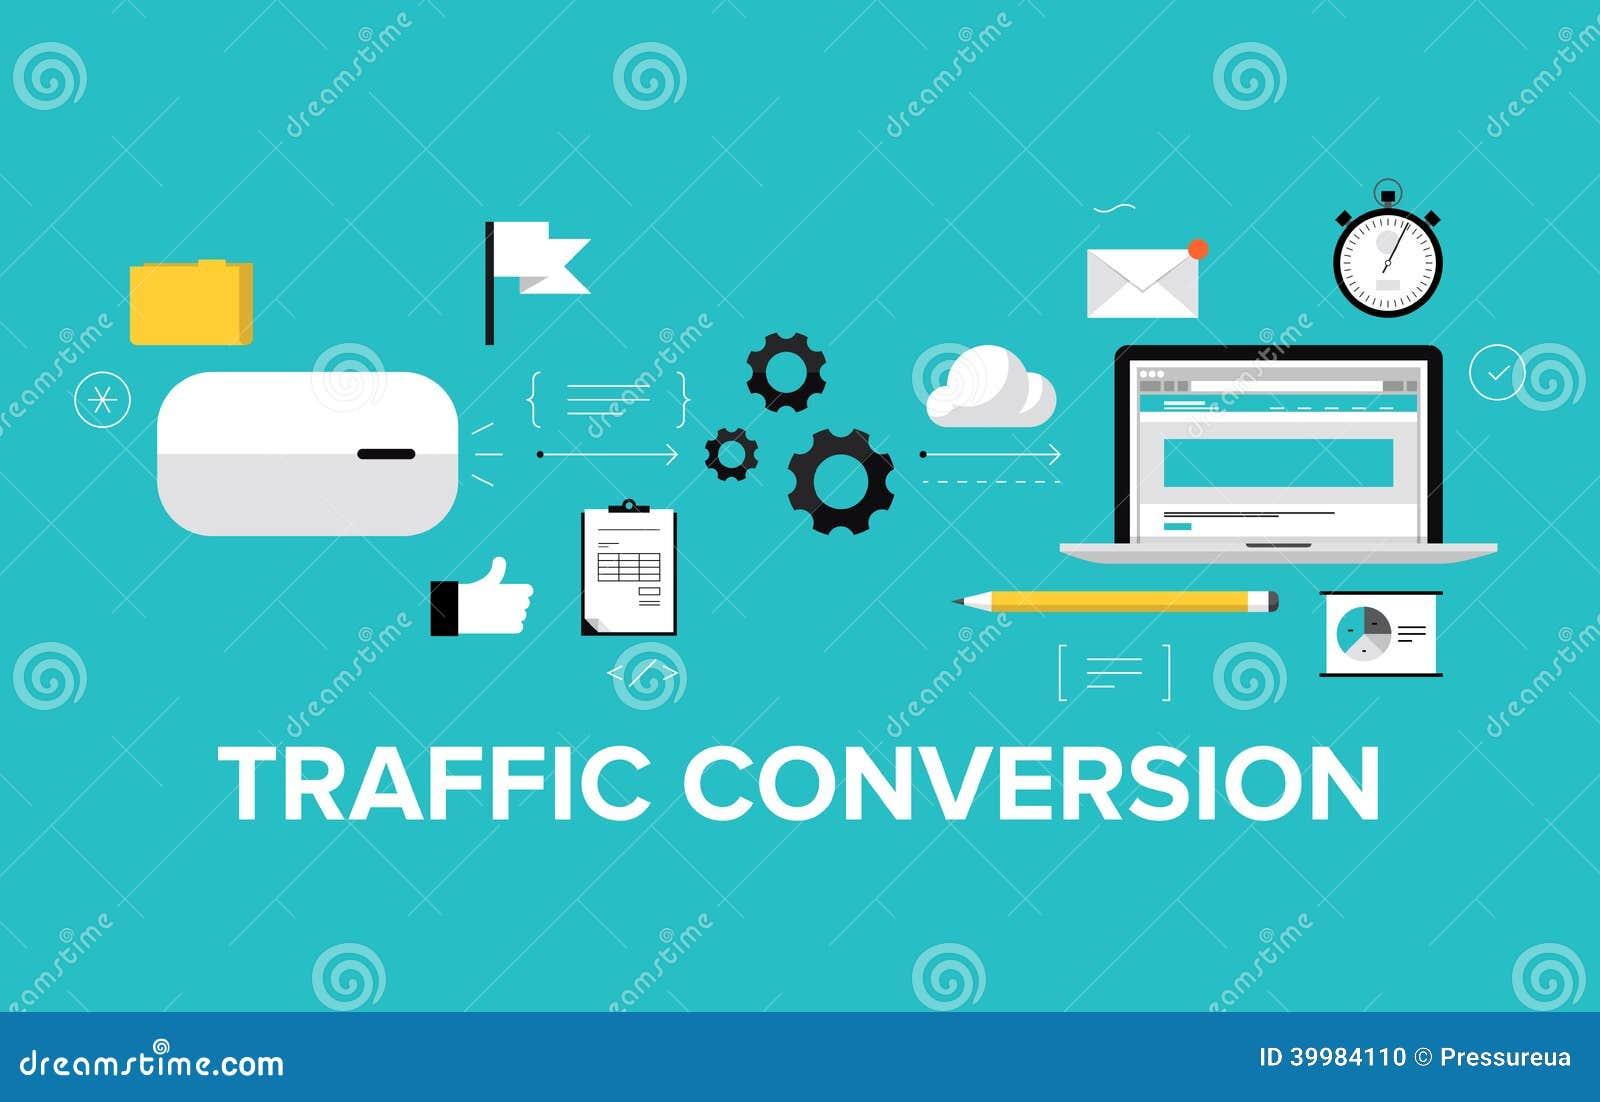 Vector Illustration Web Designs: Traffic Conversion Flat Illustration Concept Stock Vector